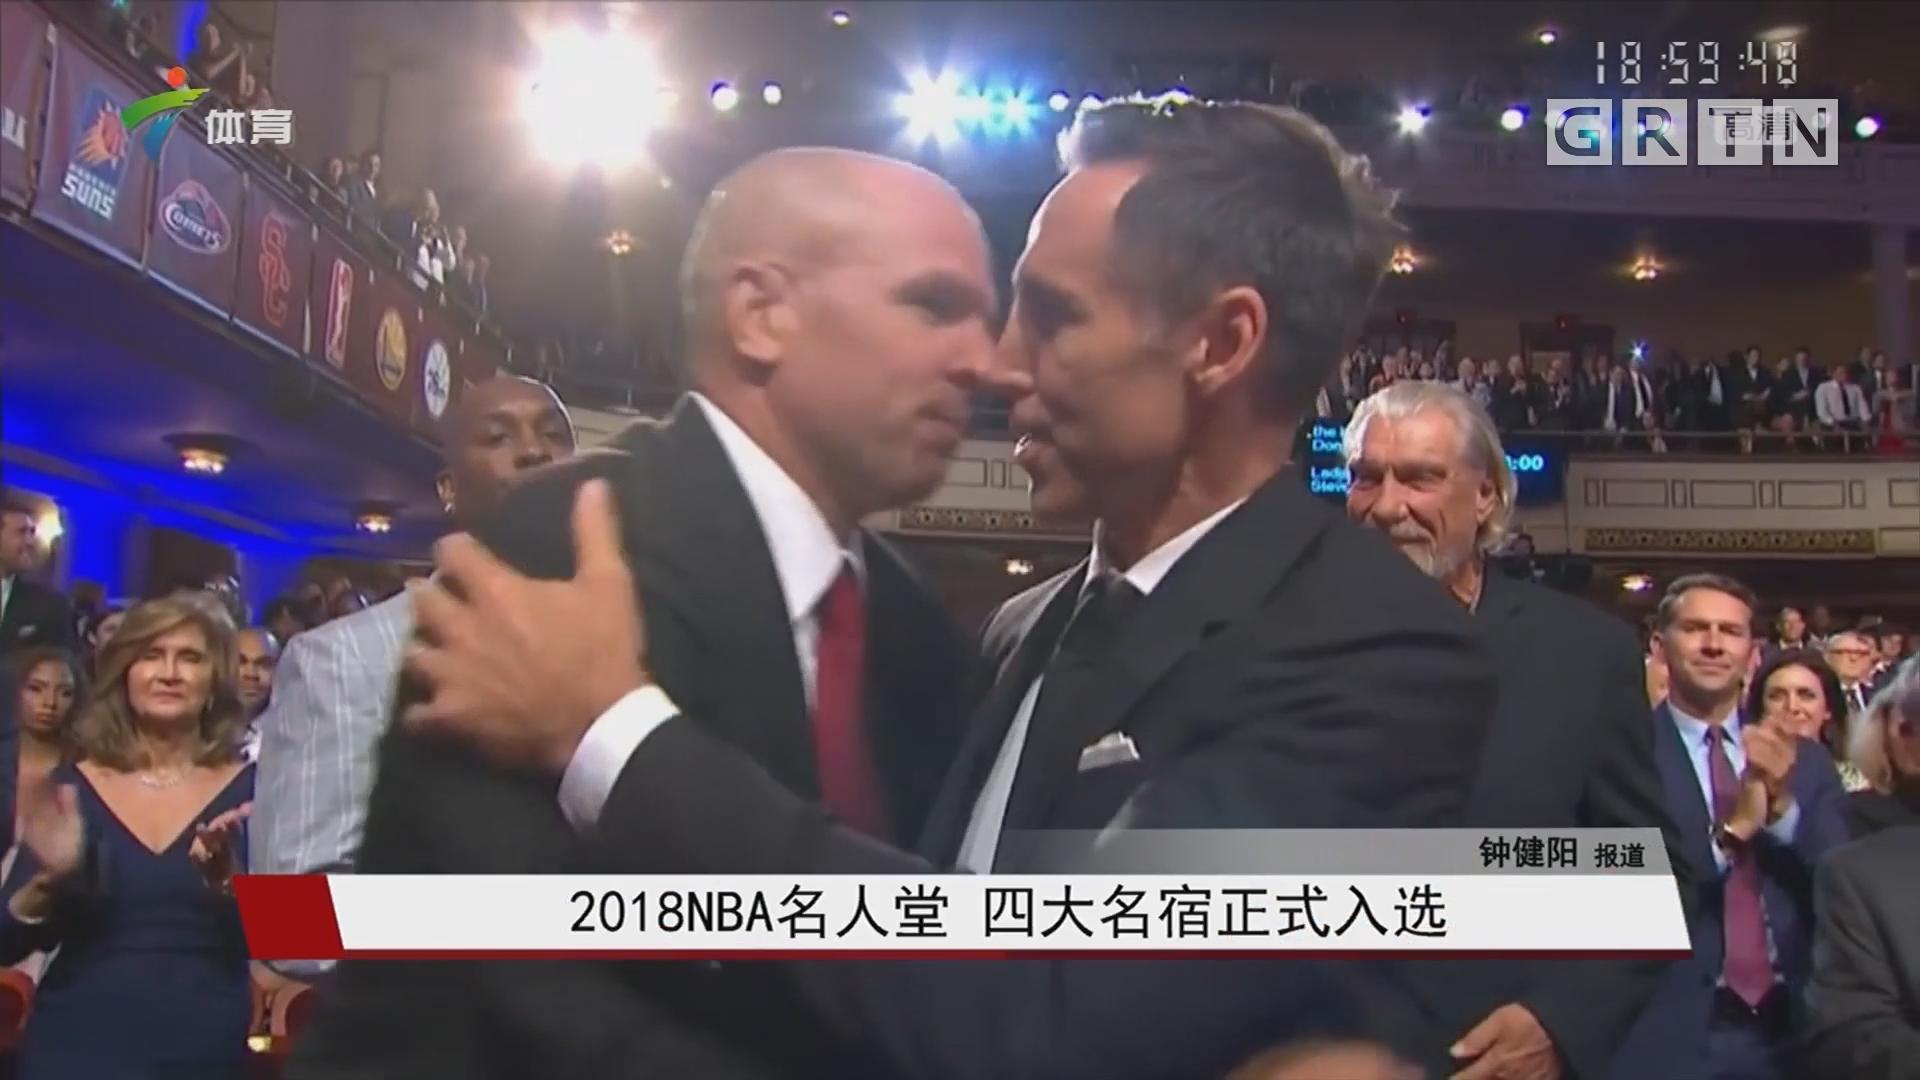 2018NBA名人堂 四大名宿正式入选